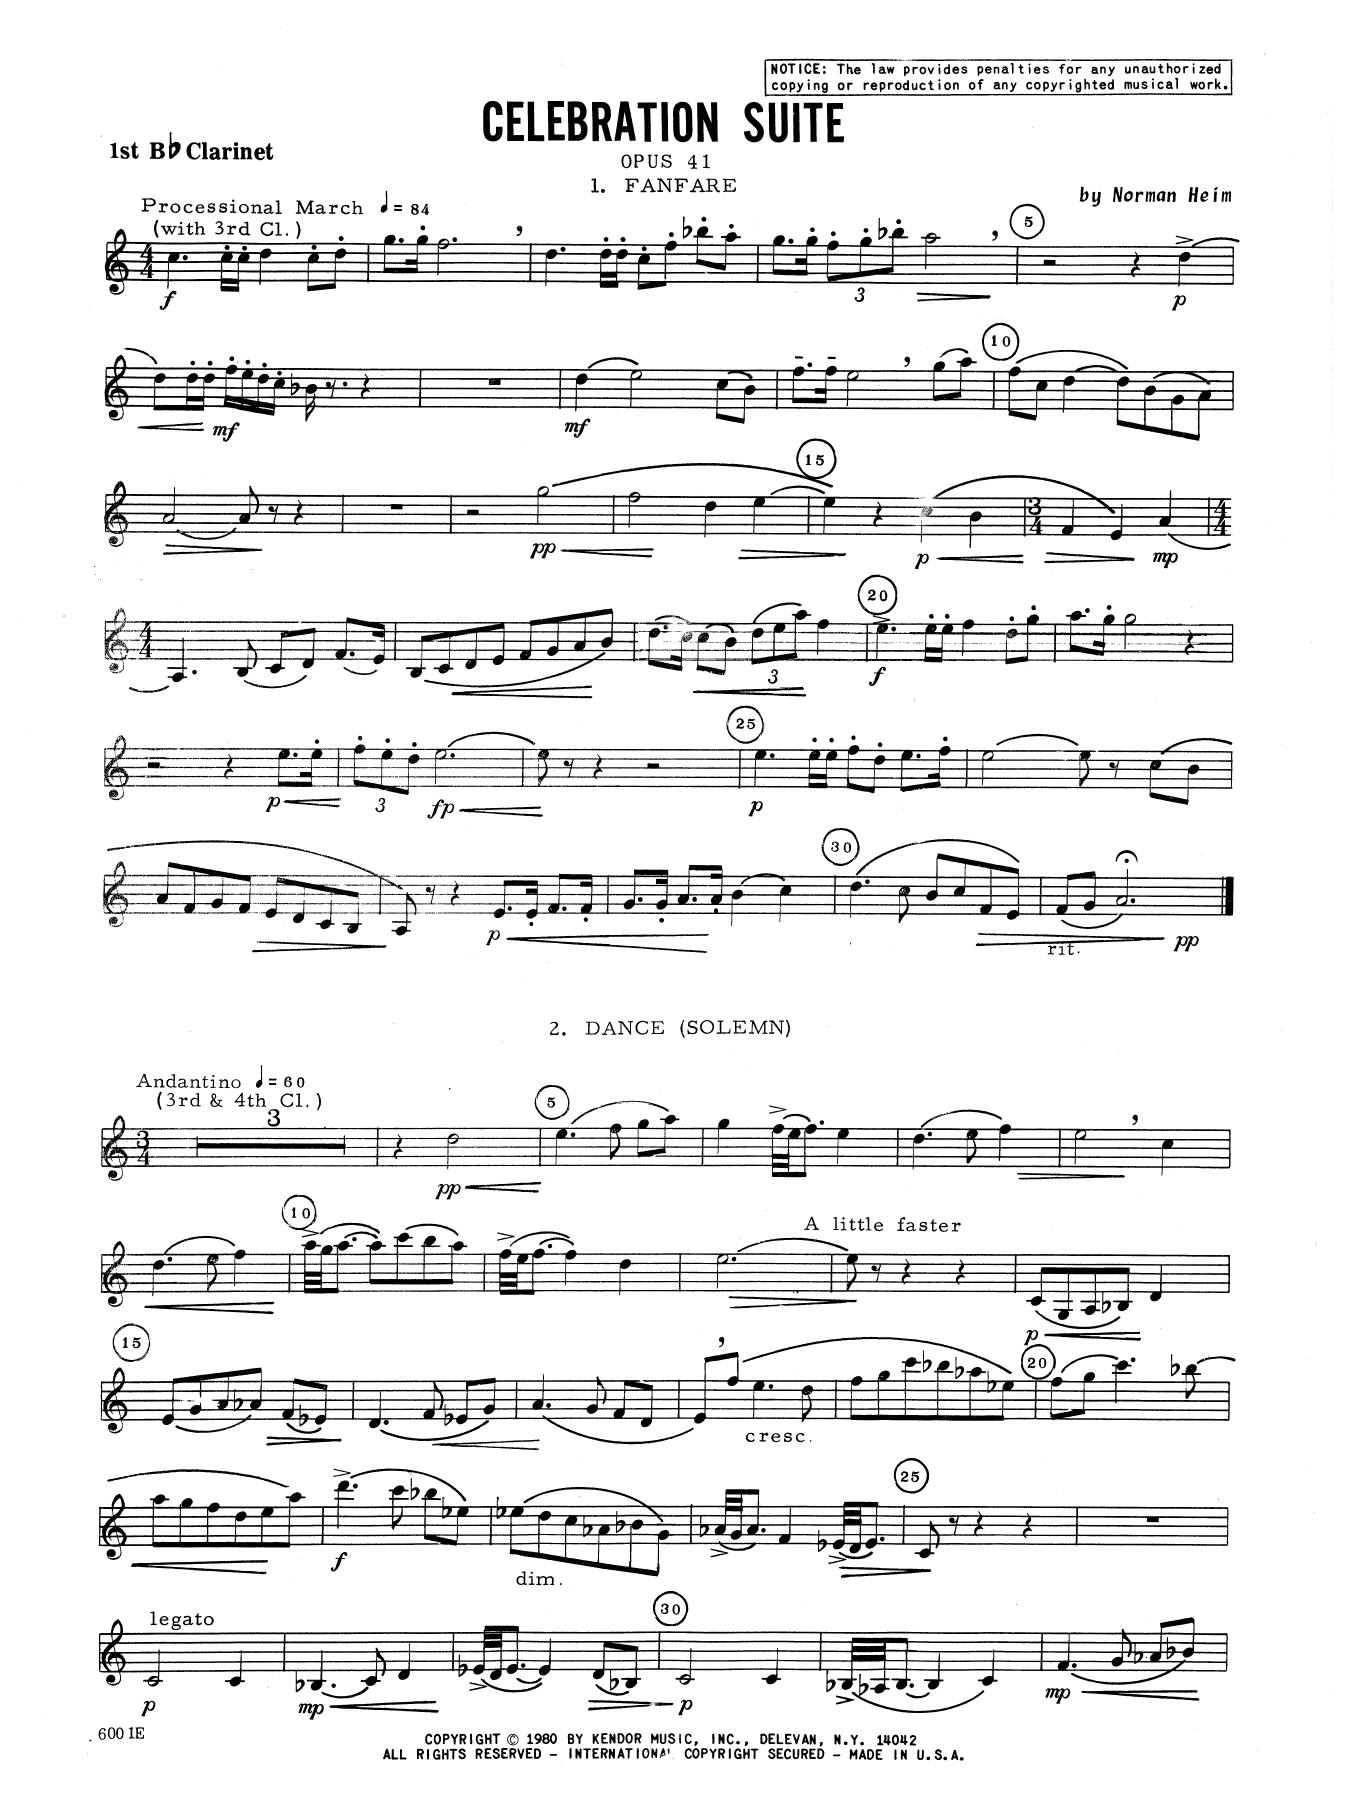 Celebration Suite - 1st Bb Clarinet Sheet Music